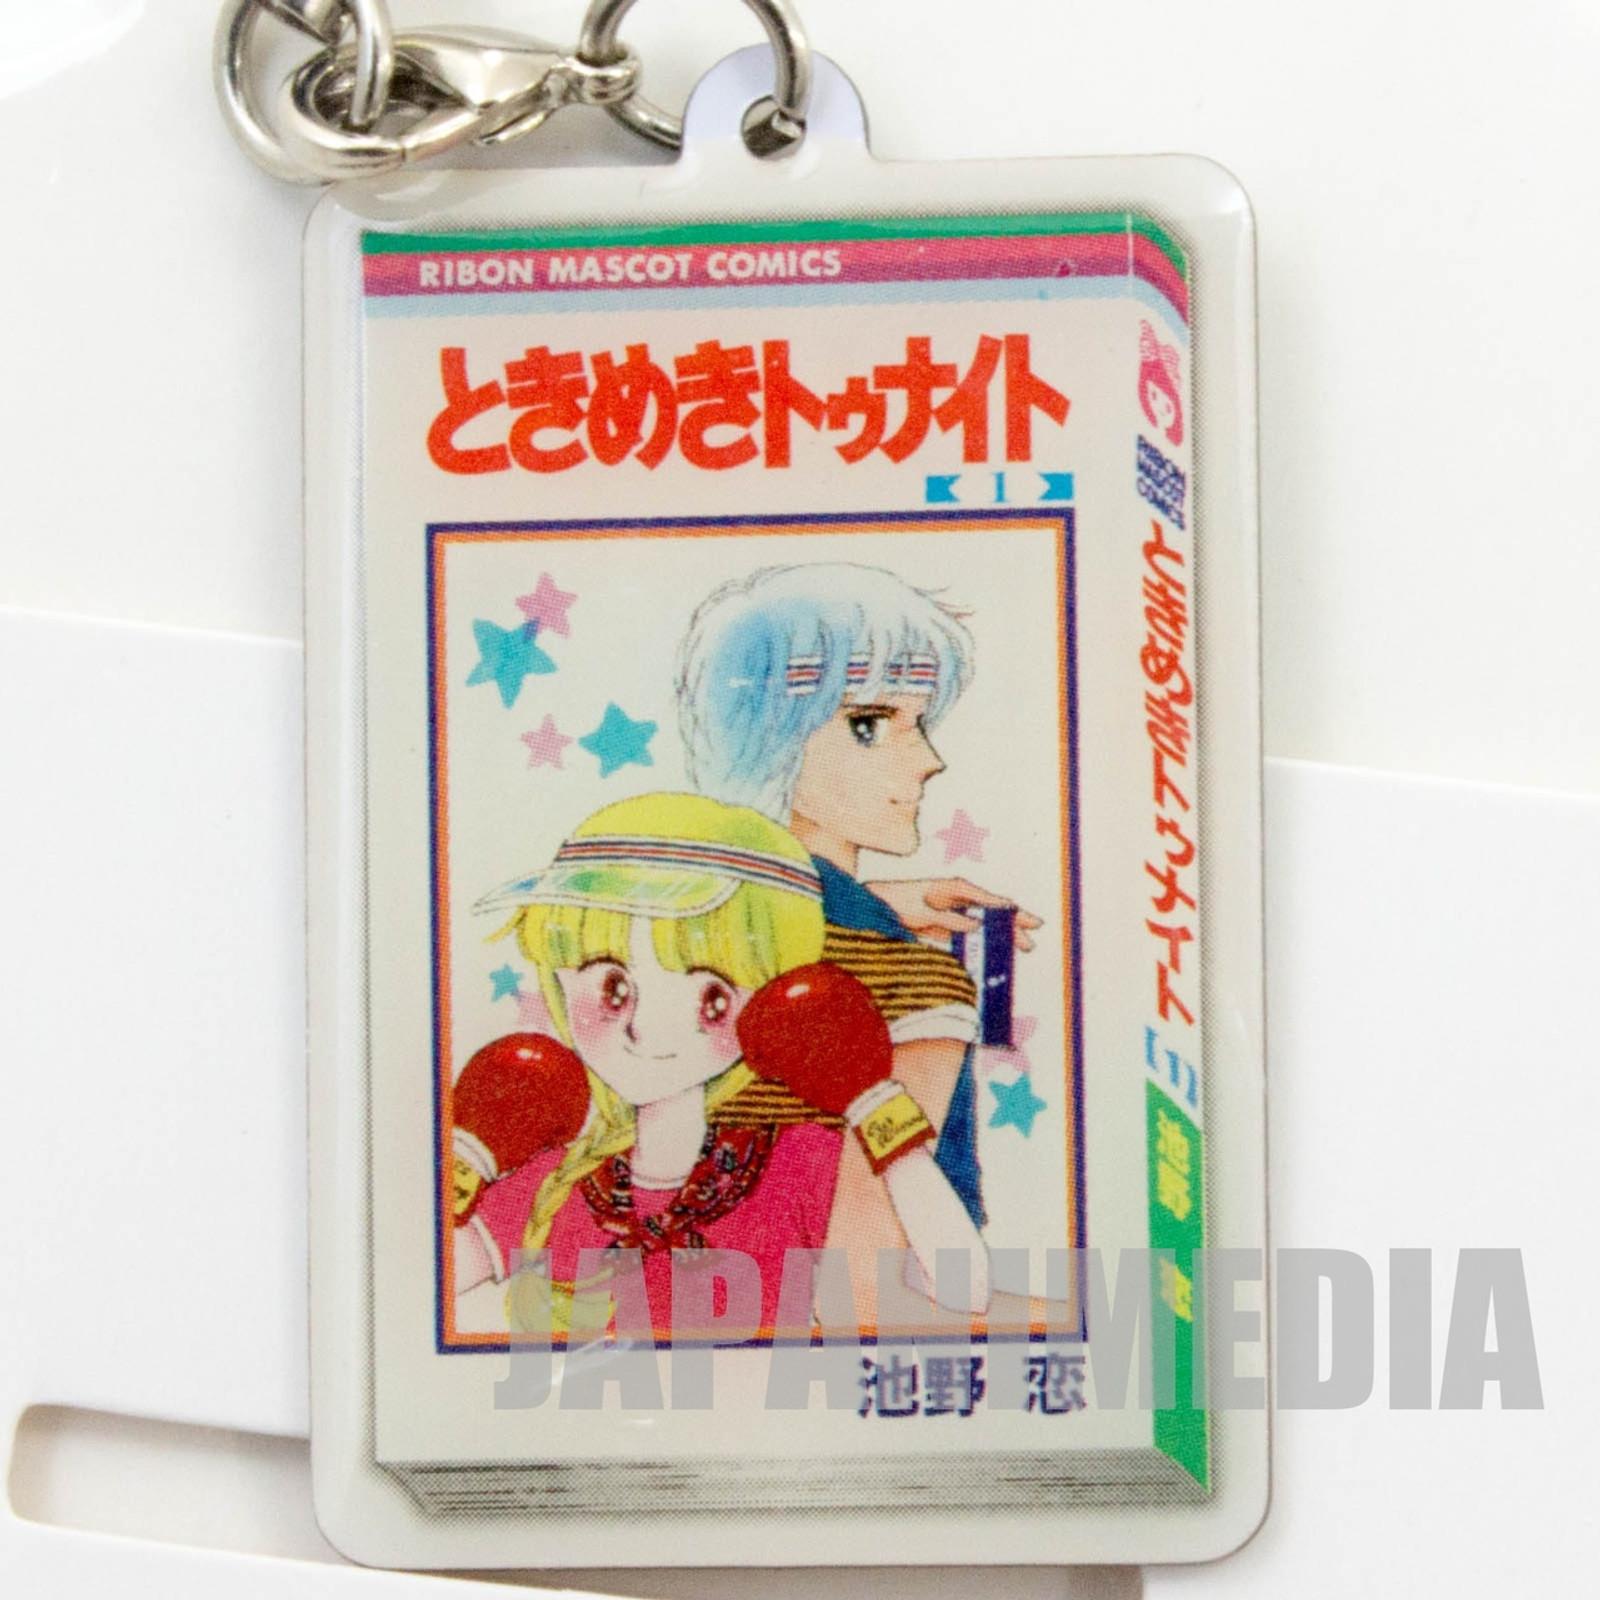 Tokimeki Tonight Vol.1 Manga Comics Type Metal Charm Strap JAPAN